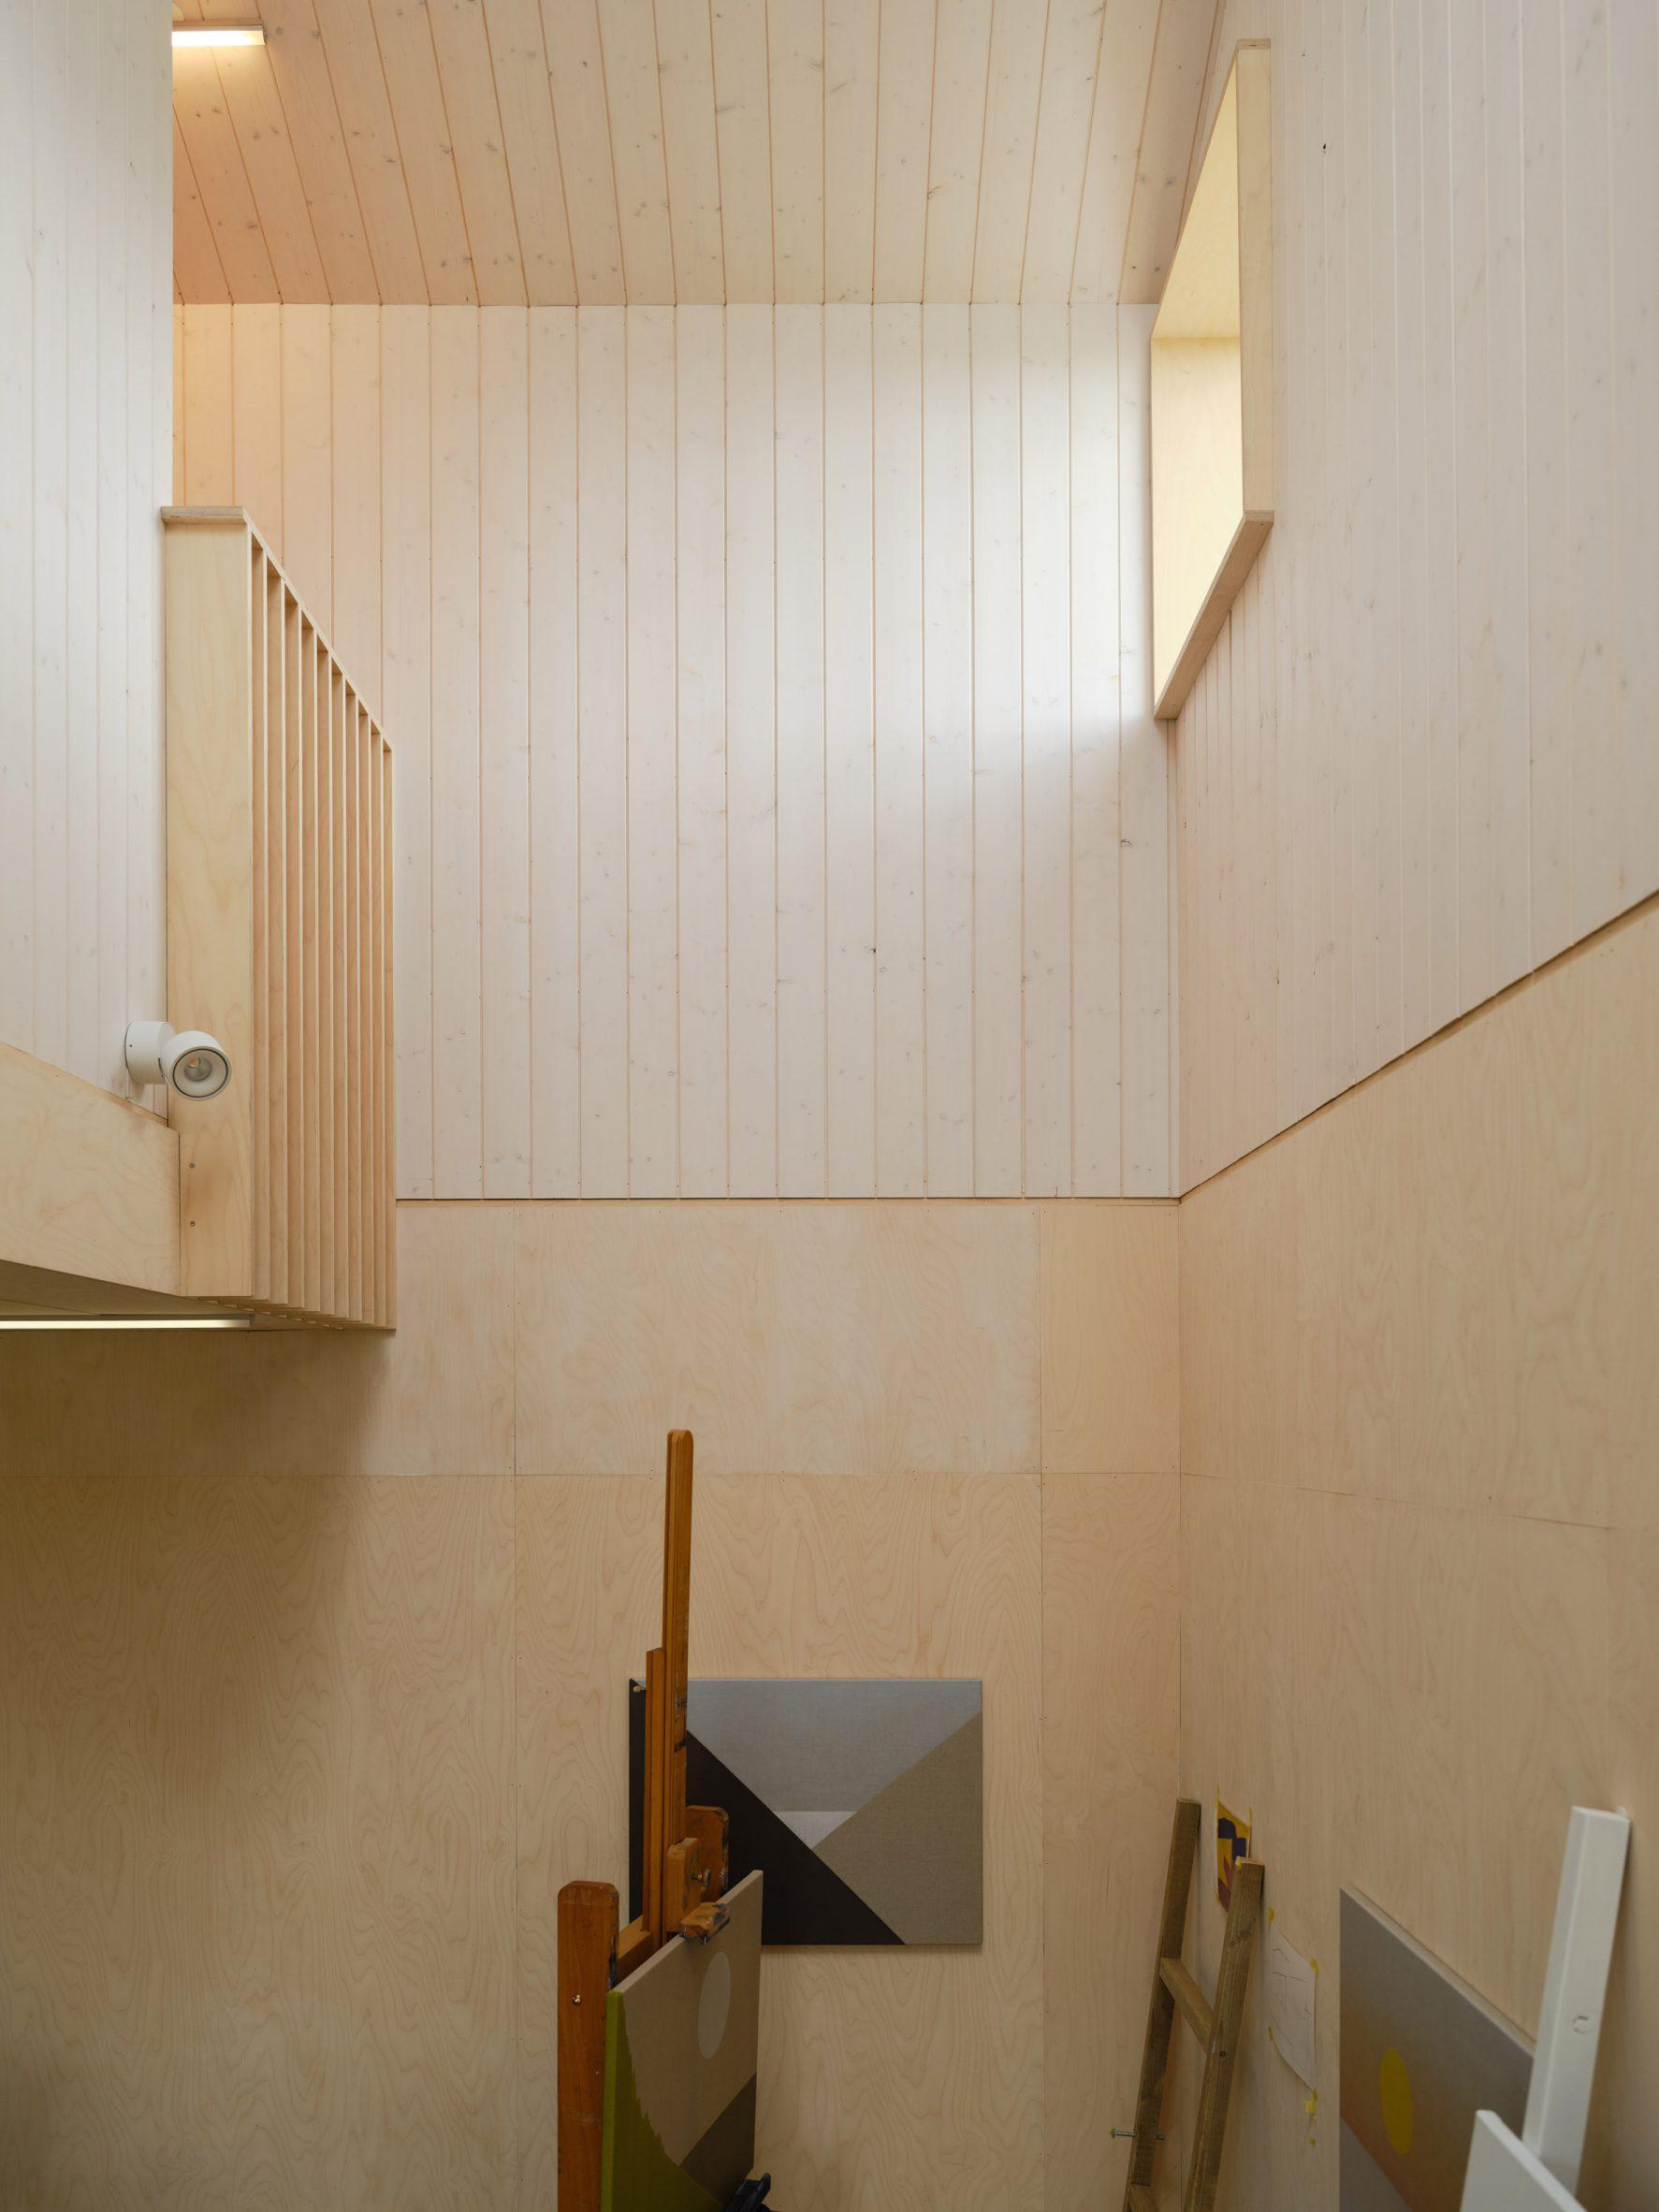 A wood-lined studio inside an Icelandic home